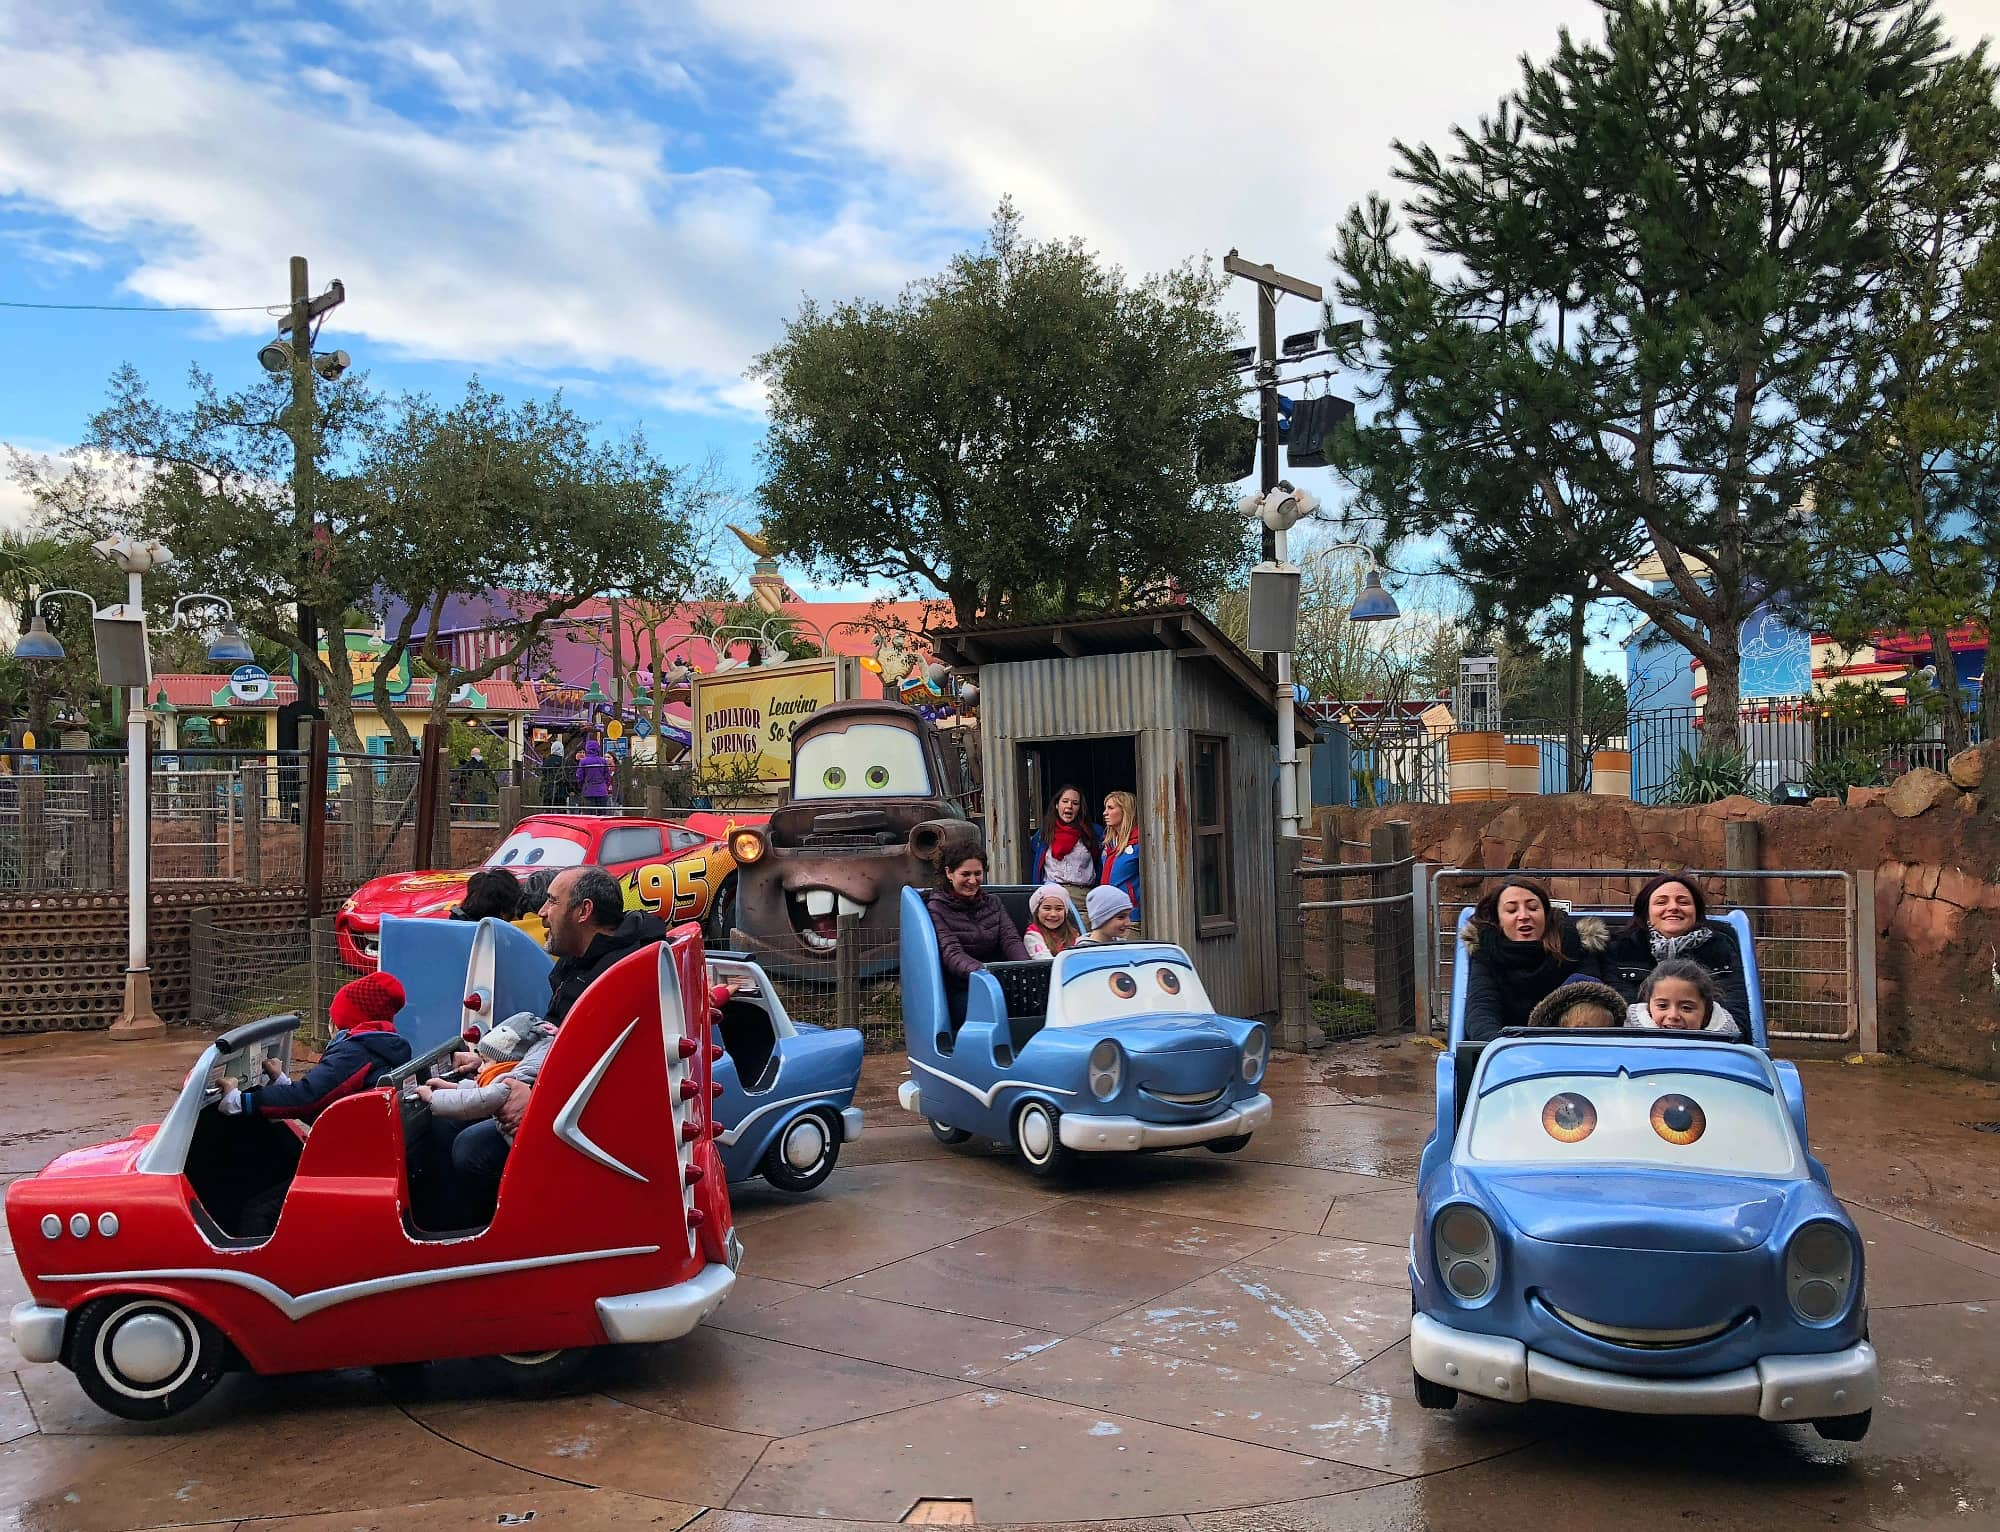 Cars Quatre Roues Rallye, or Cars Race Rally at Walt Disney Studios Park at Disneyland Paris with kids